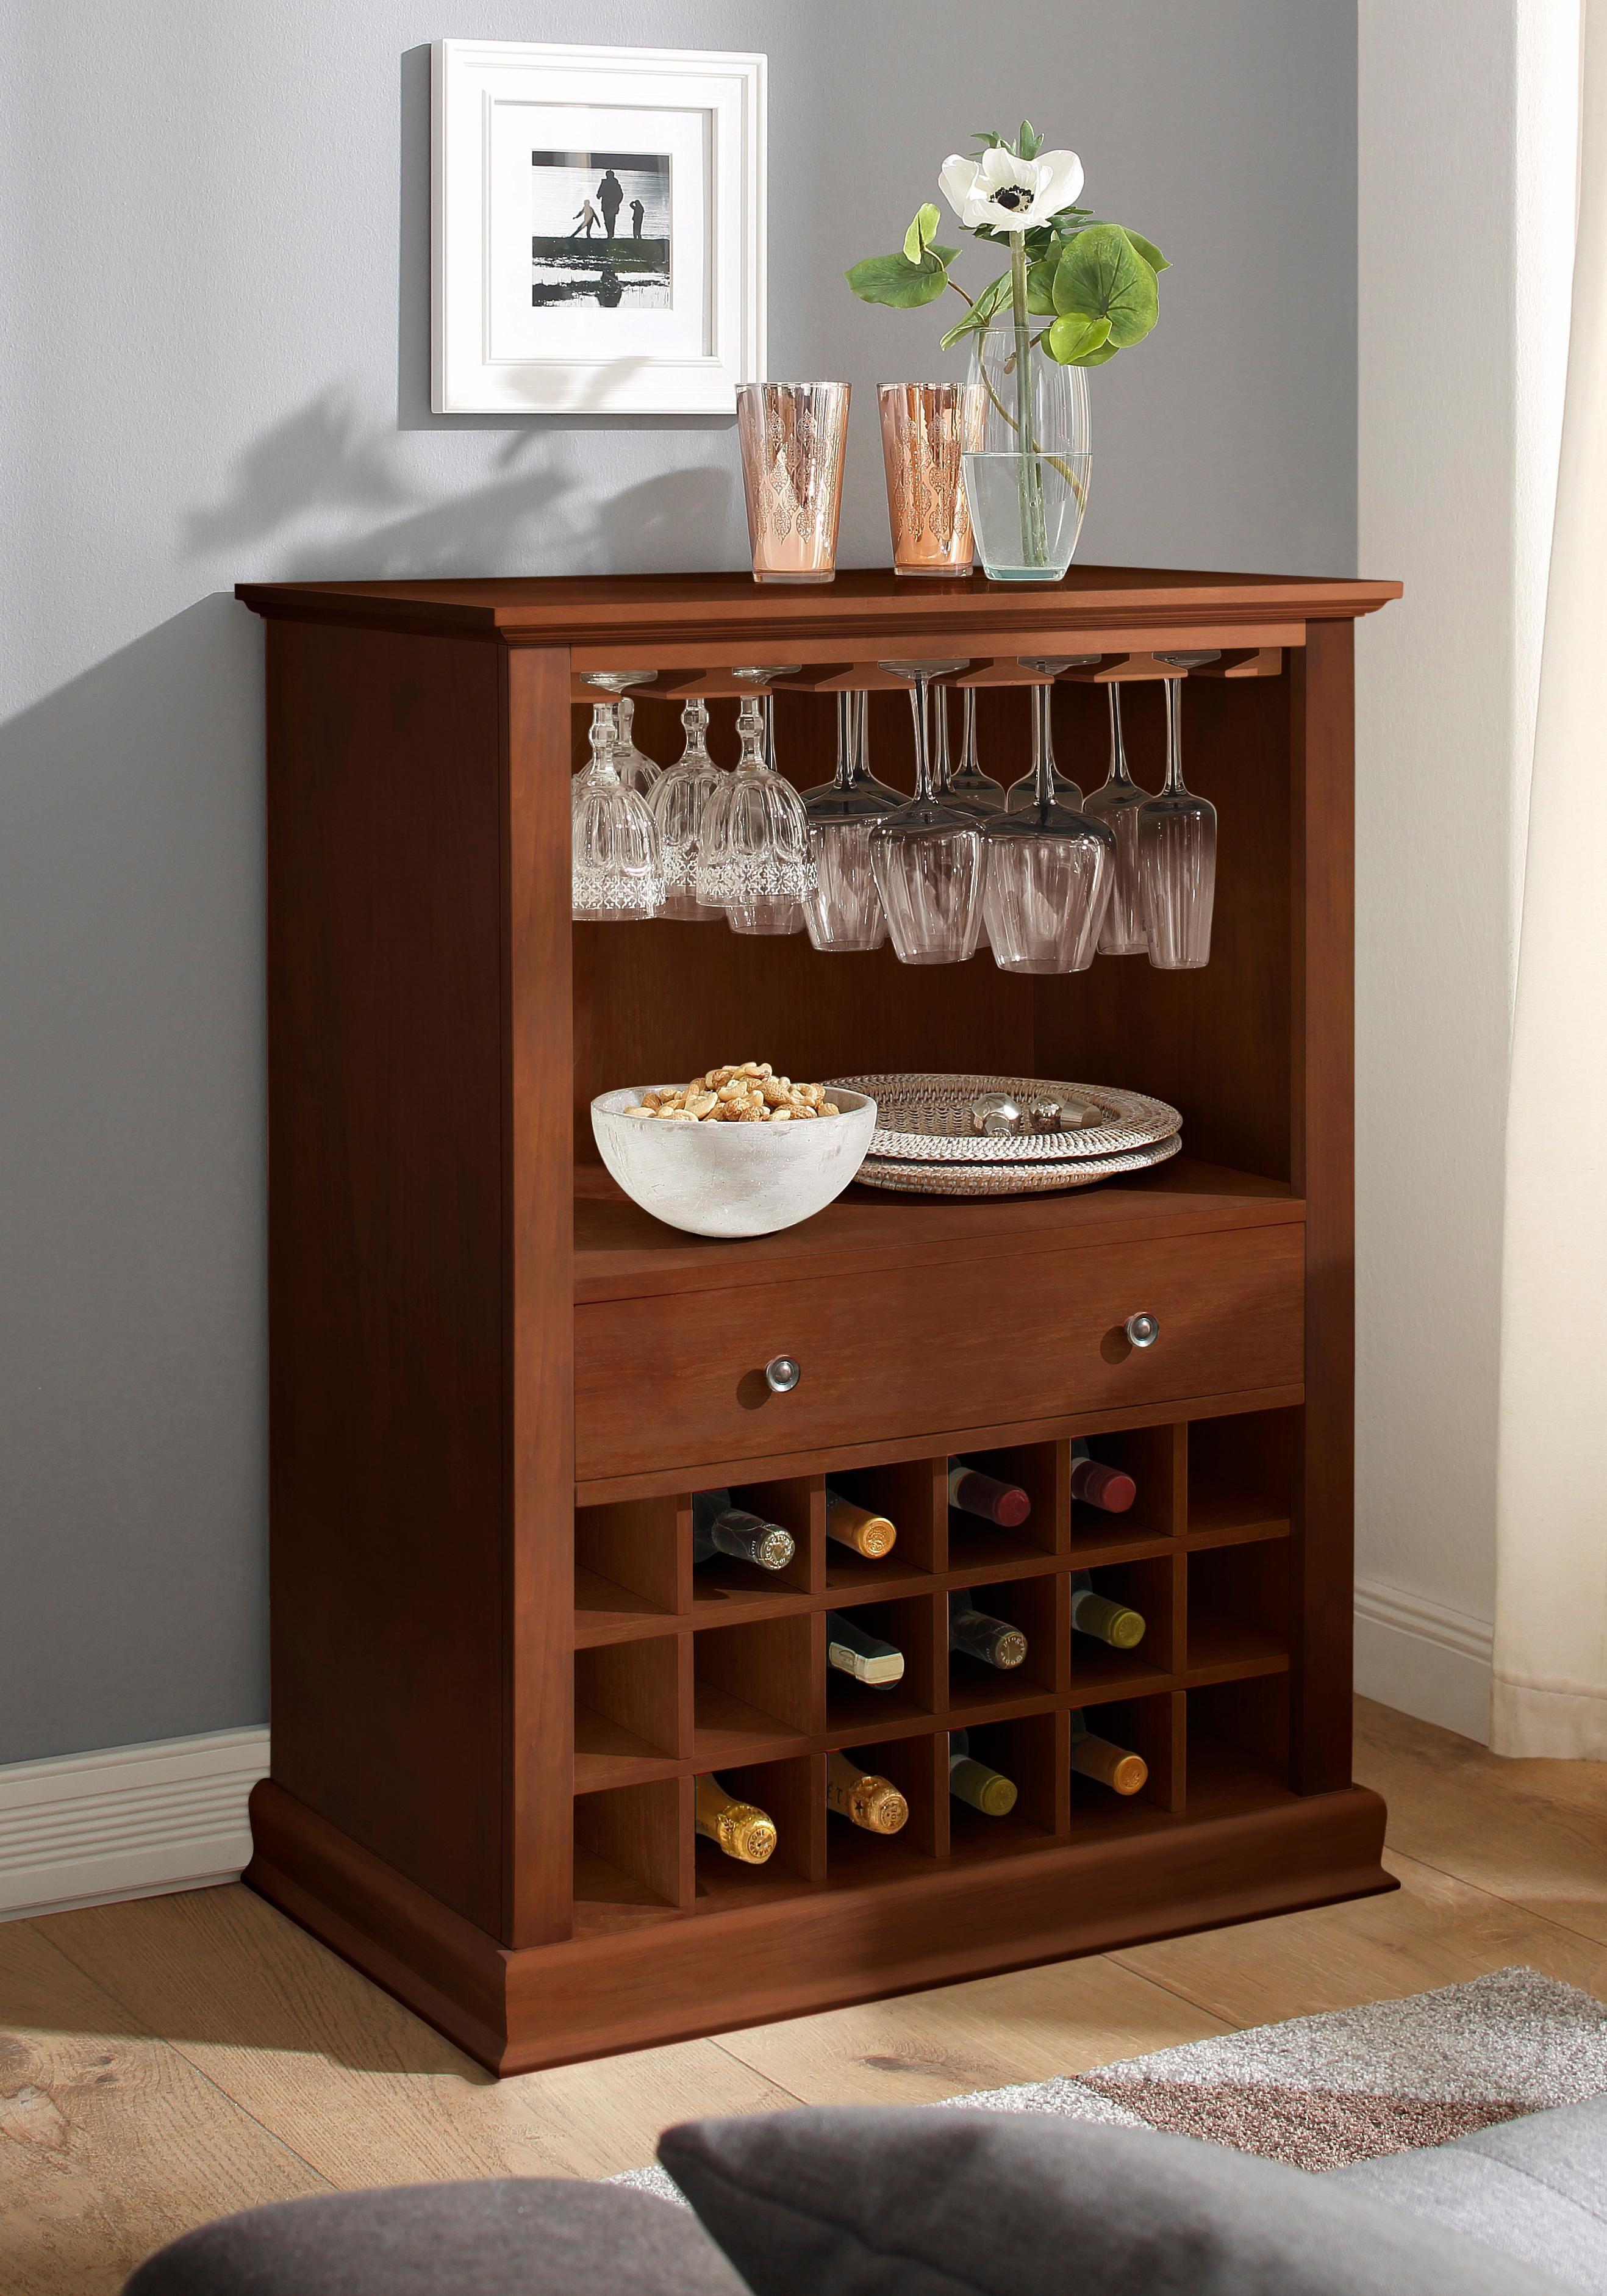 weinregal design weinregale aus holz weinregale aus holz. Black Bedroom Furniture Sets. Home Design Ideas